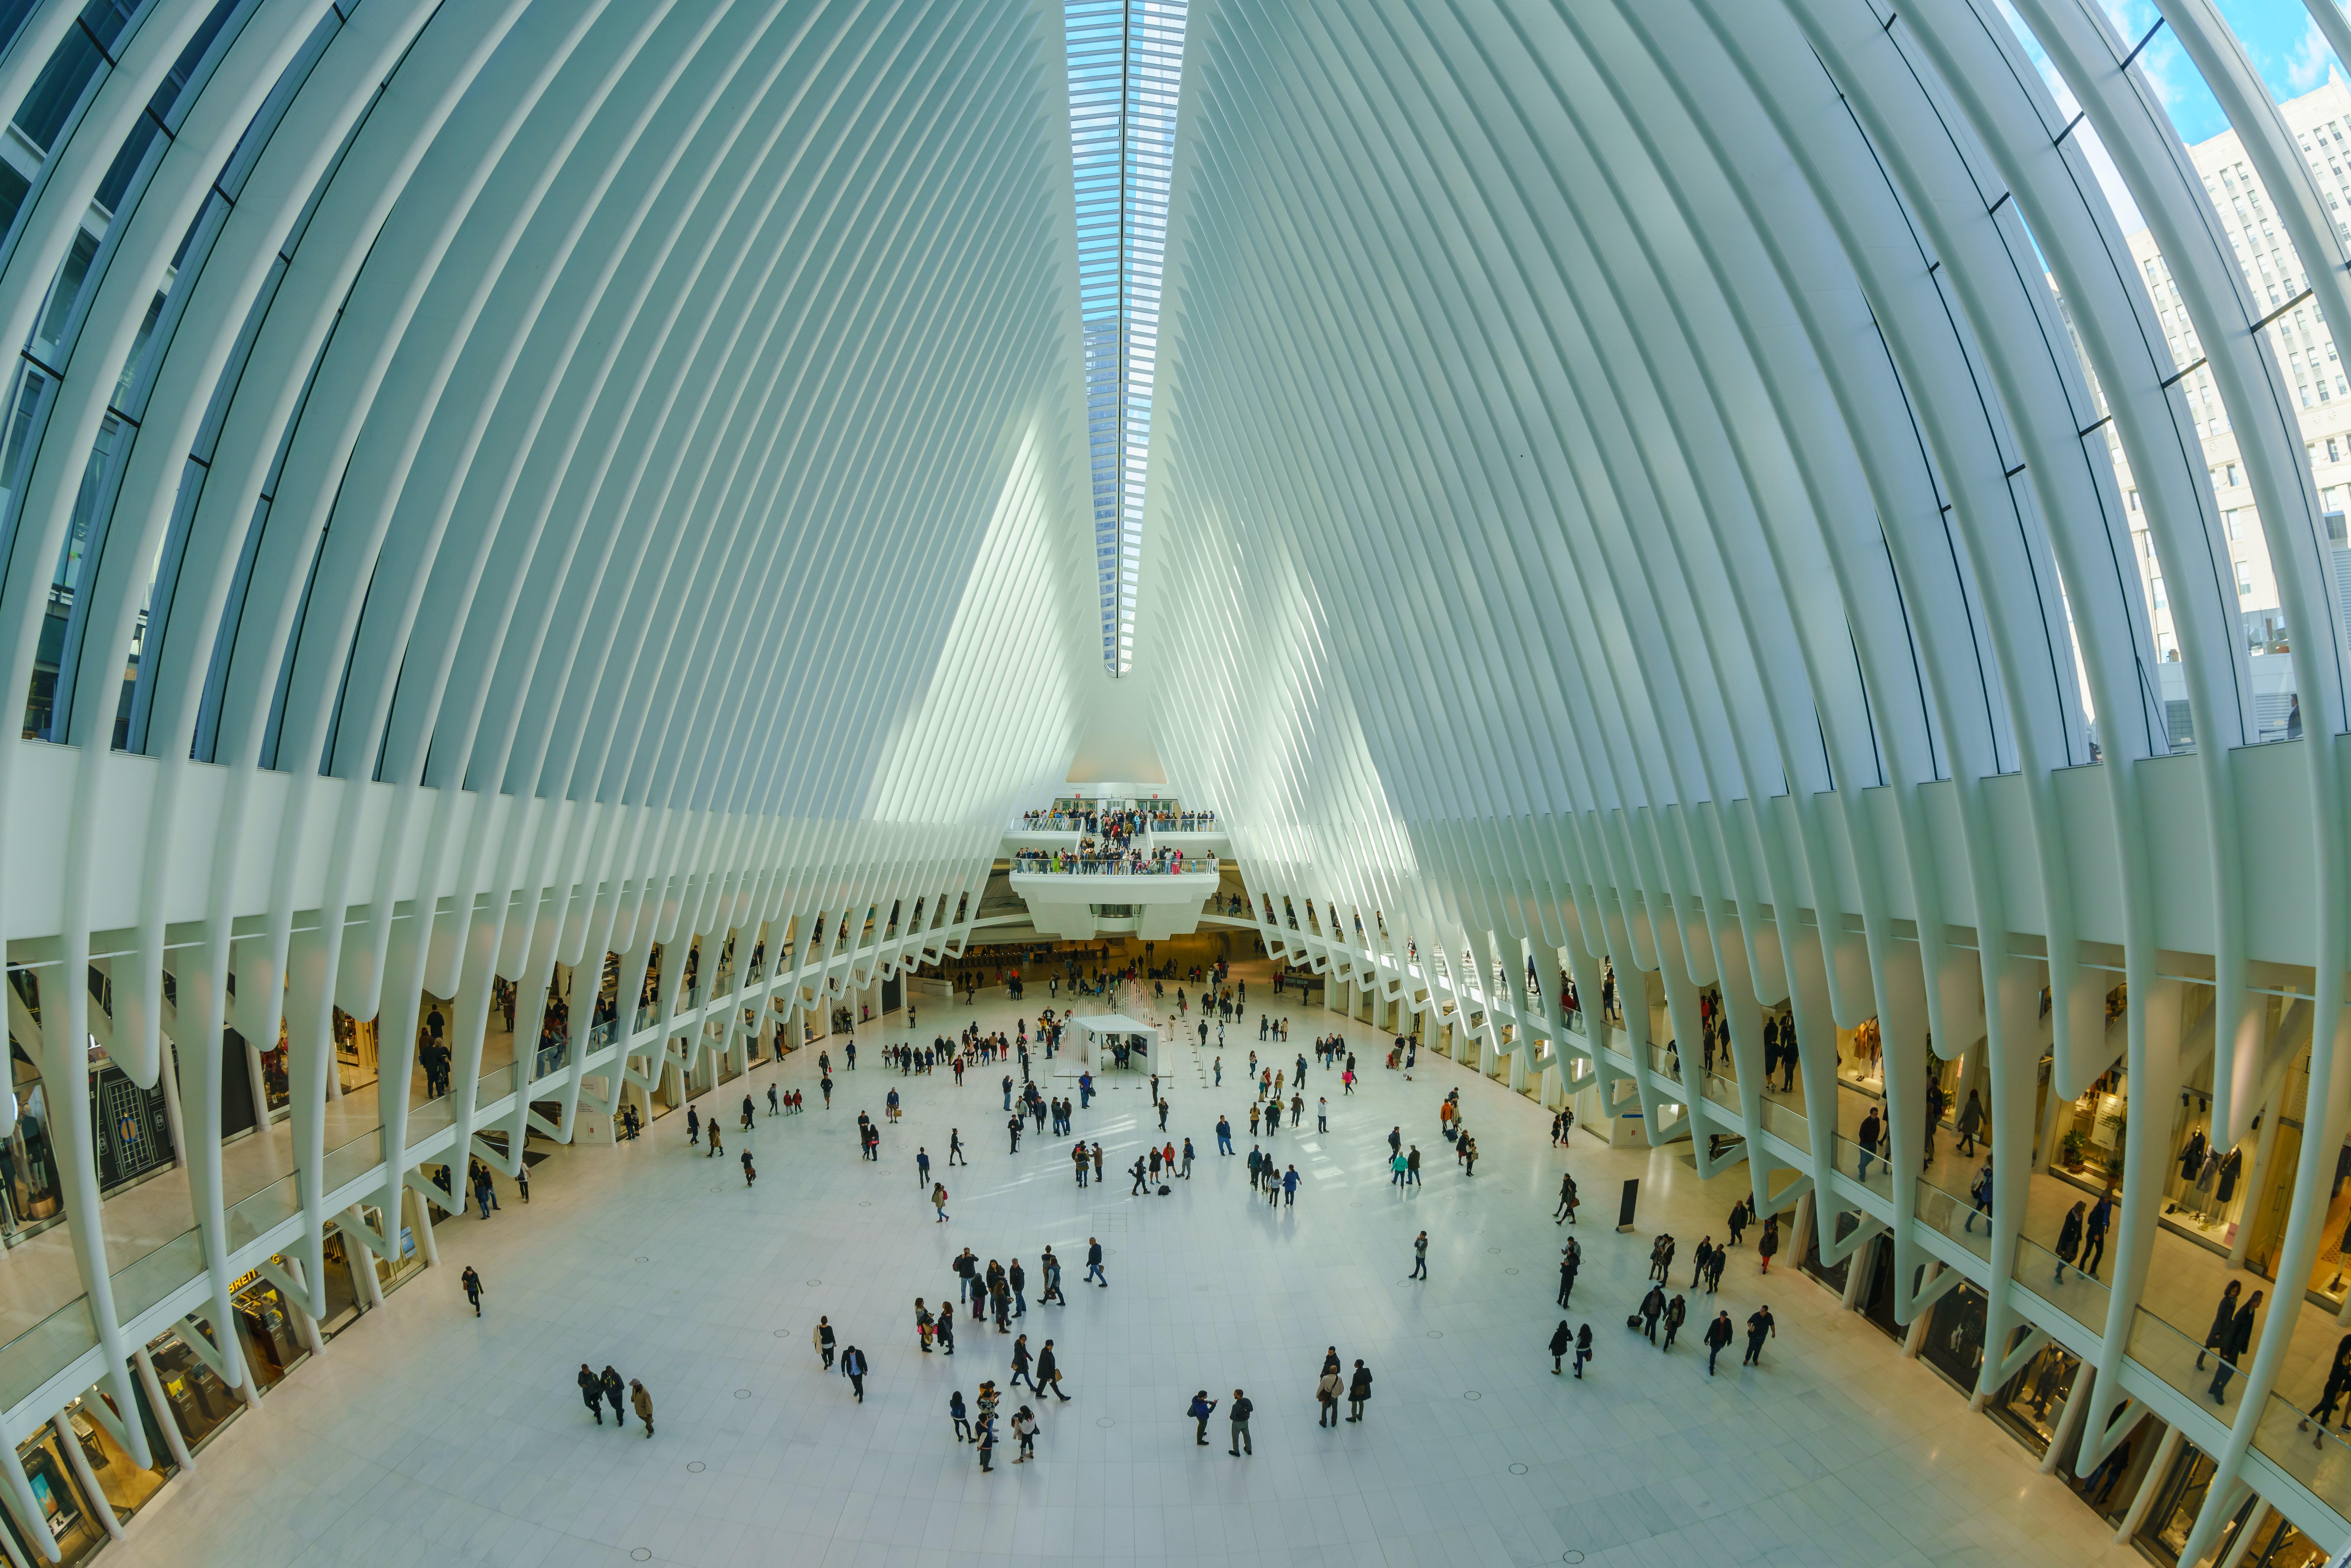 Westfield World Trade Center, New York City | Source: Shutterstock